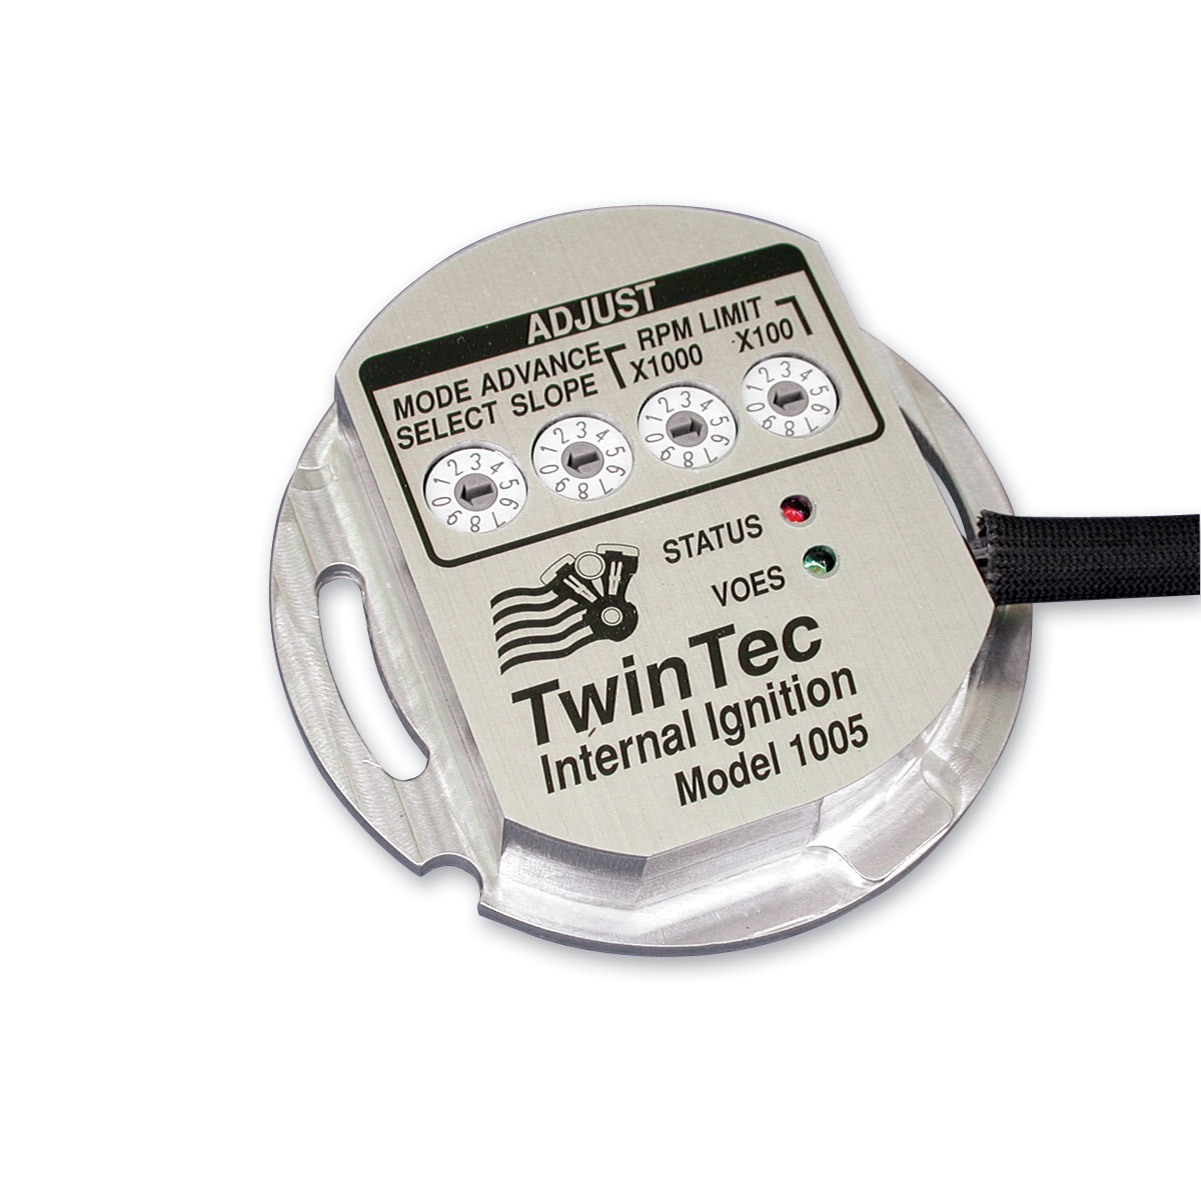 Daytona Twin Tec Fully Programmable Ignition